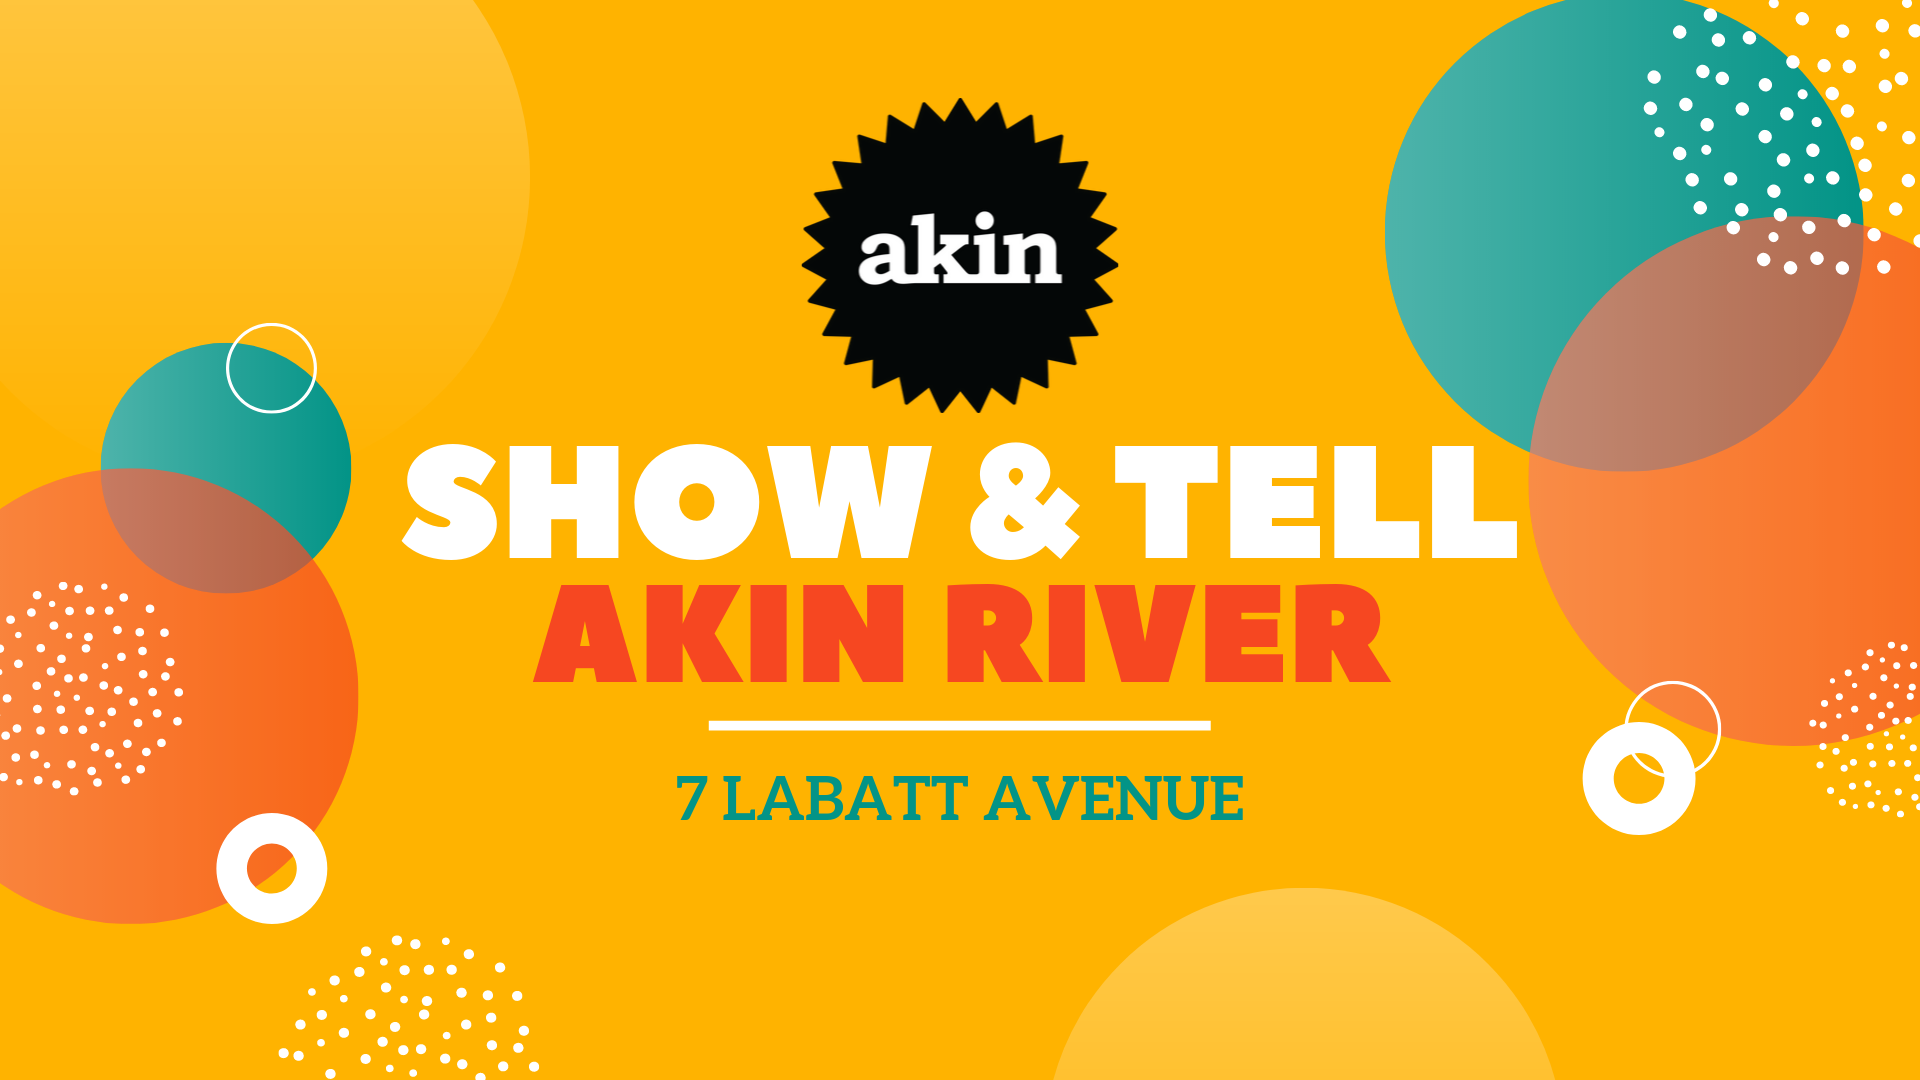 Show & Tell at Akin River.png